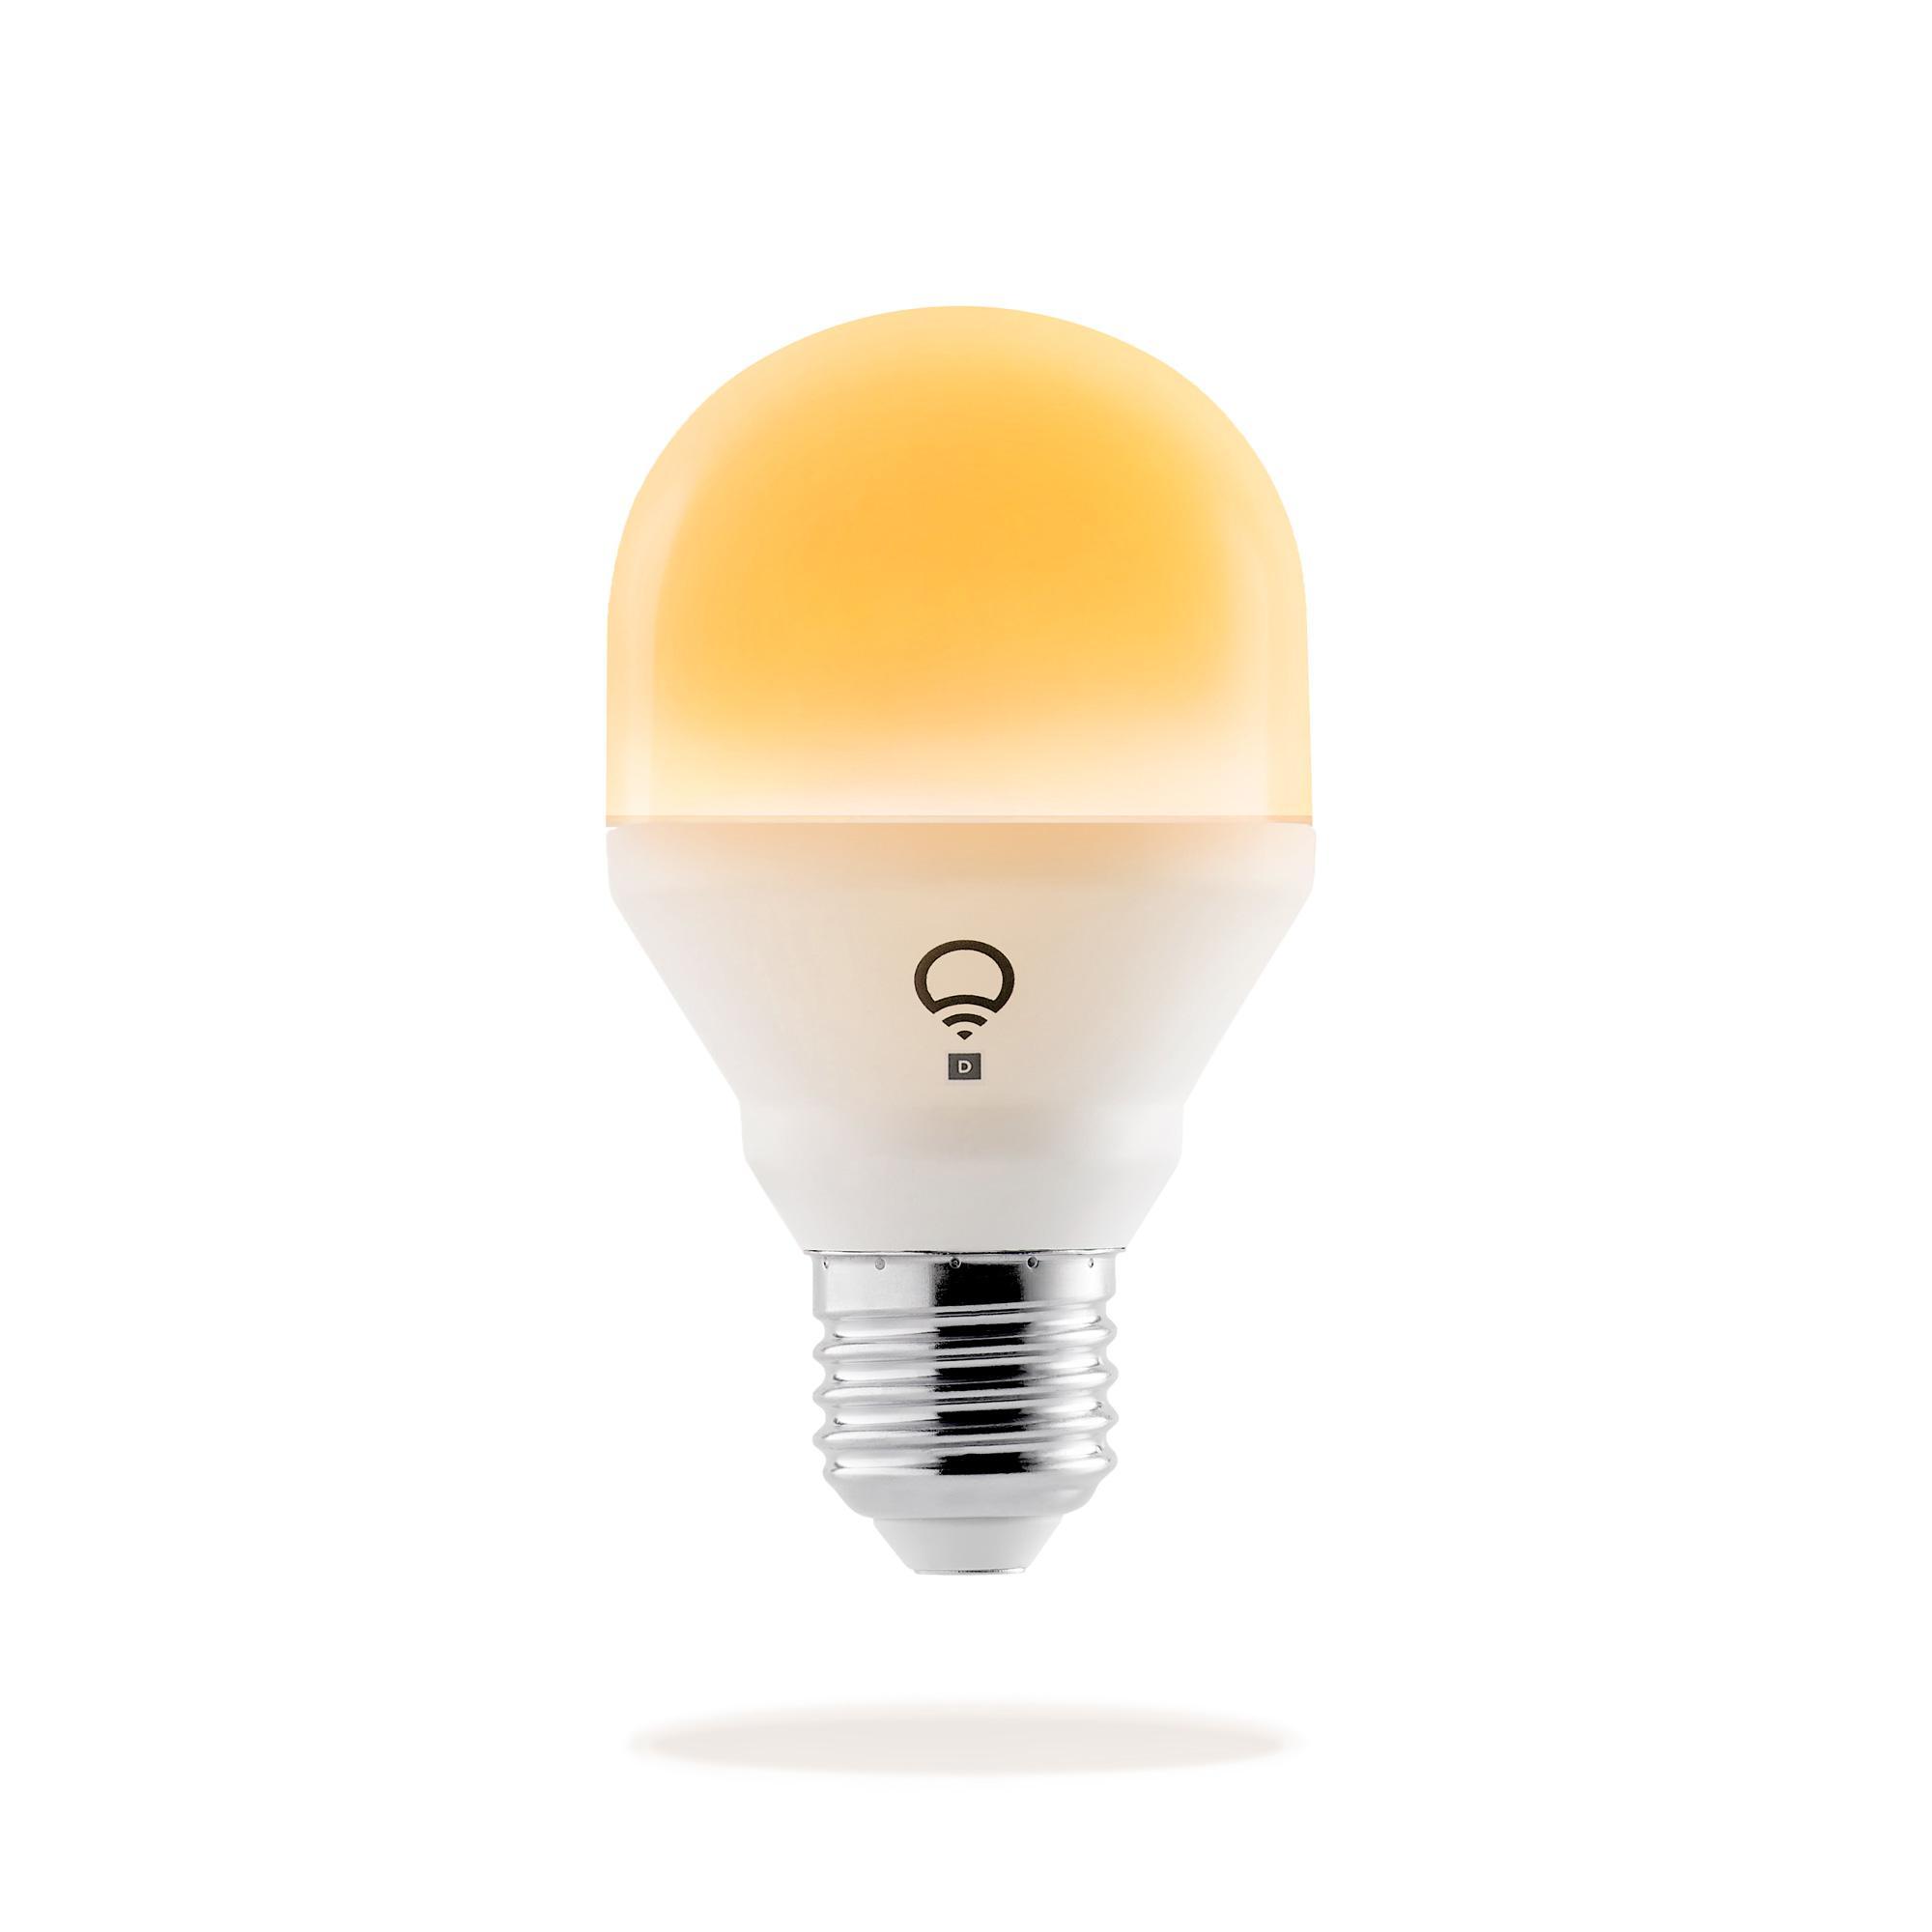 Lifx lamp